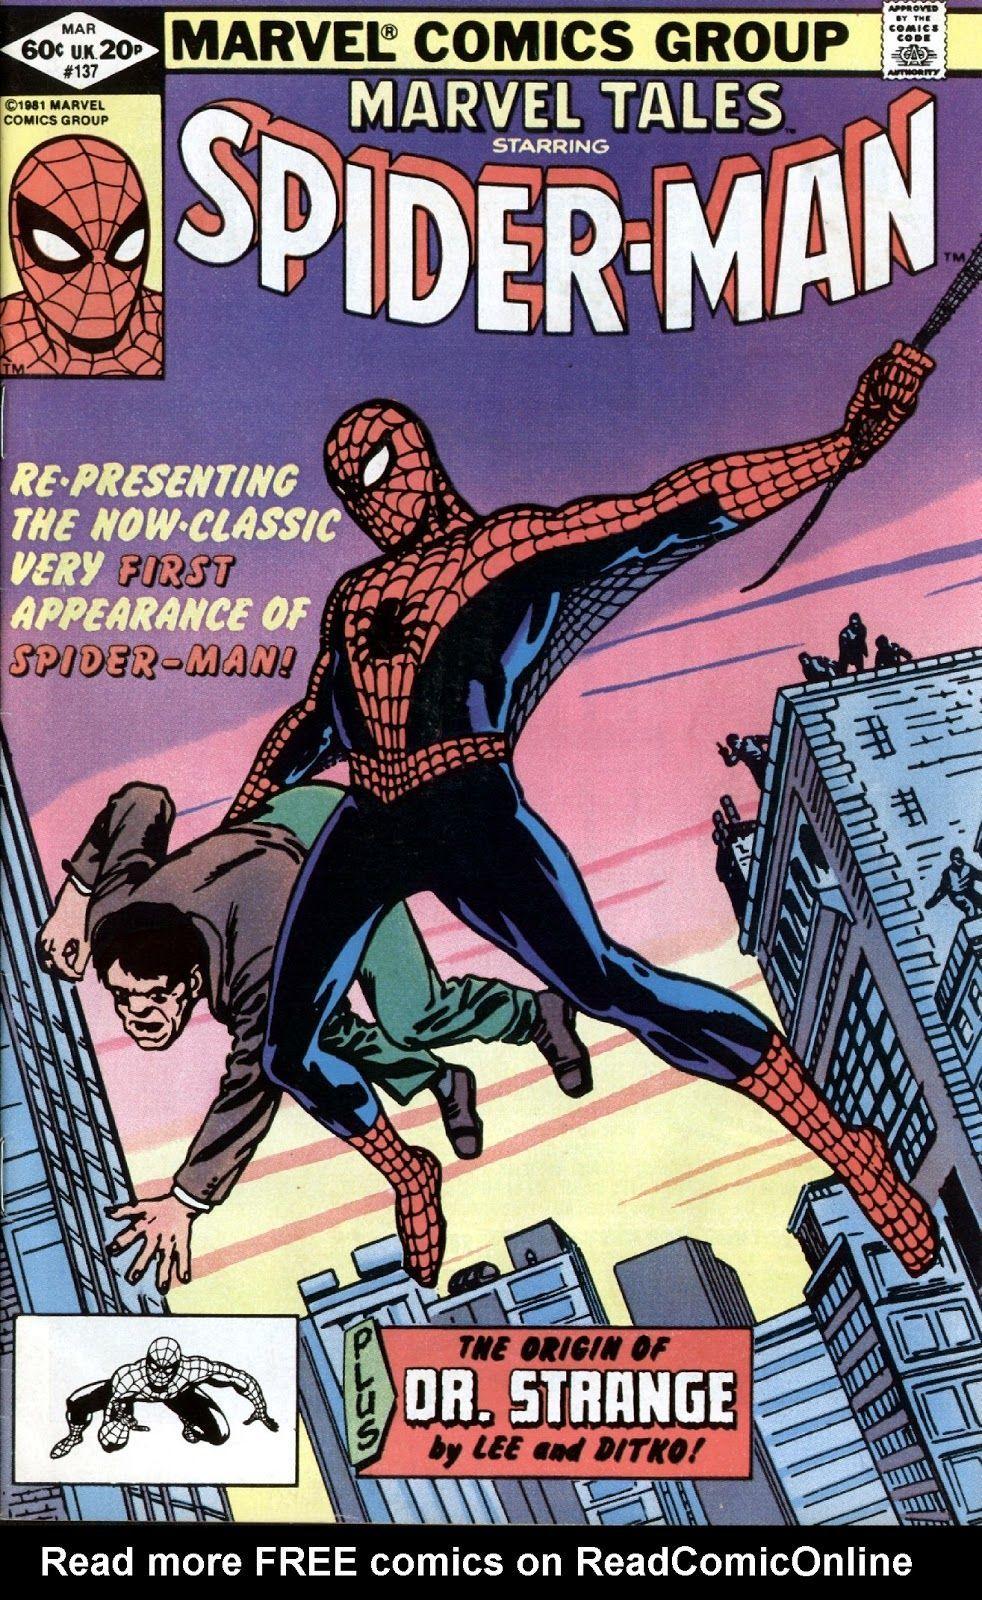 Marvel Tales #137 (Writer Stan Lee, Artists Steve Ditko, Cover Jack Kirby)